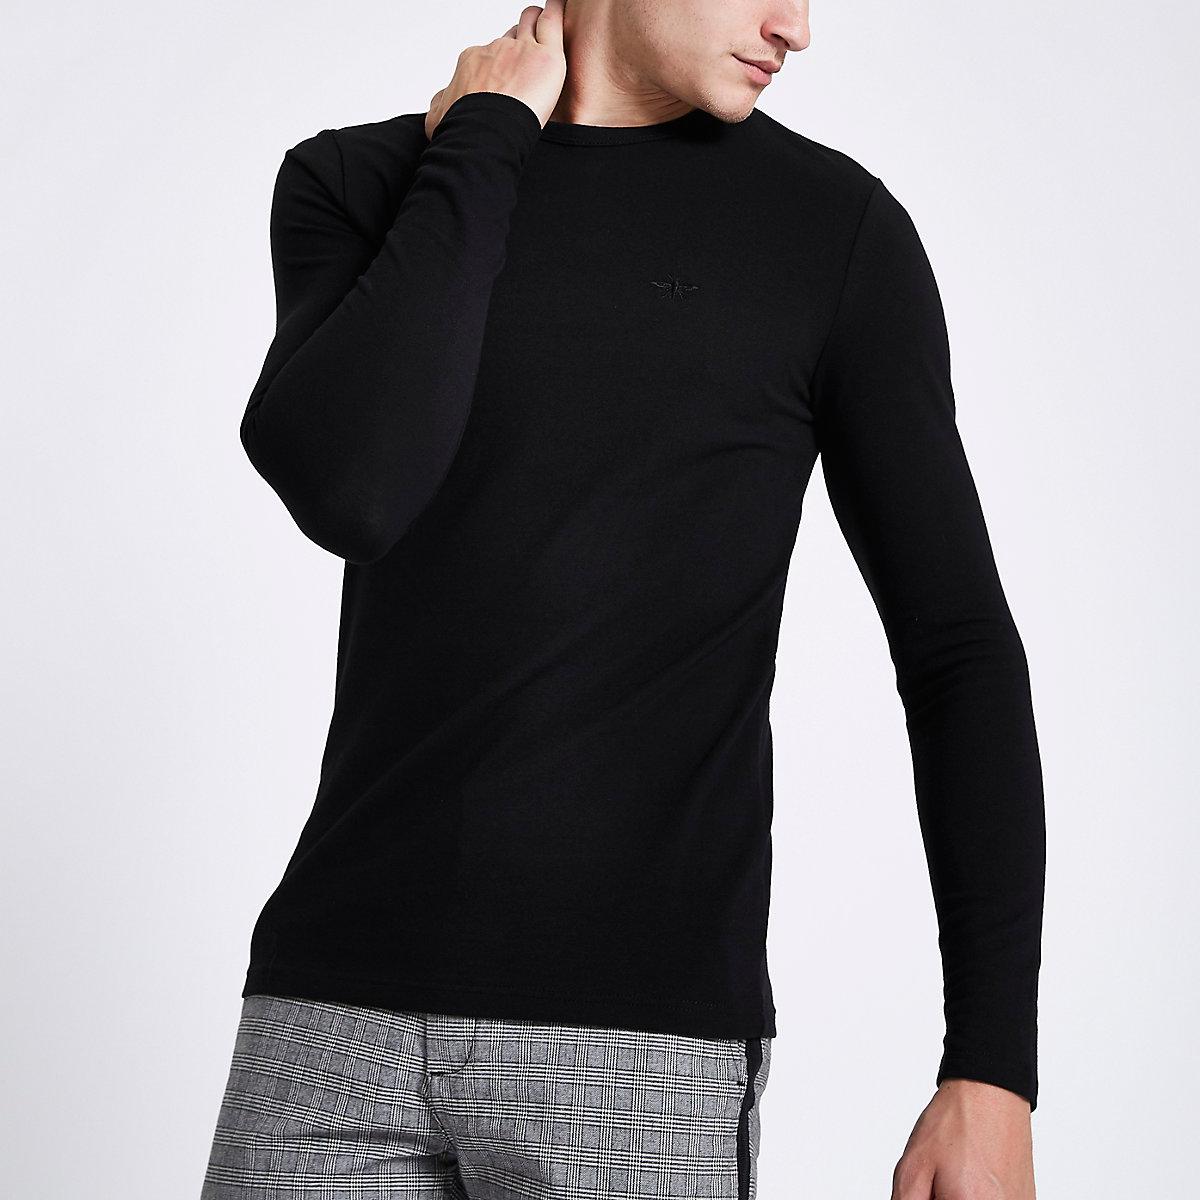 Black pique long sleeve muscle fit T-shirt